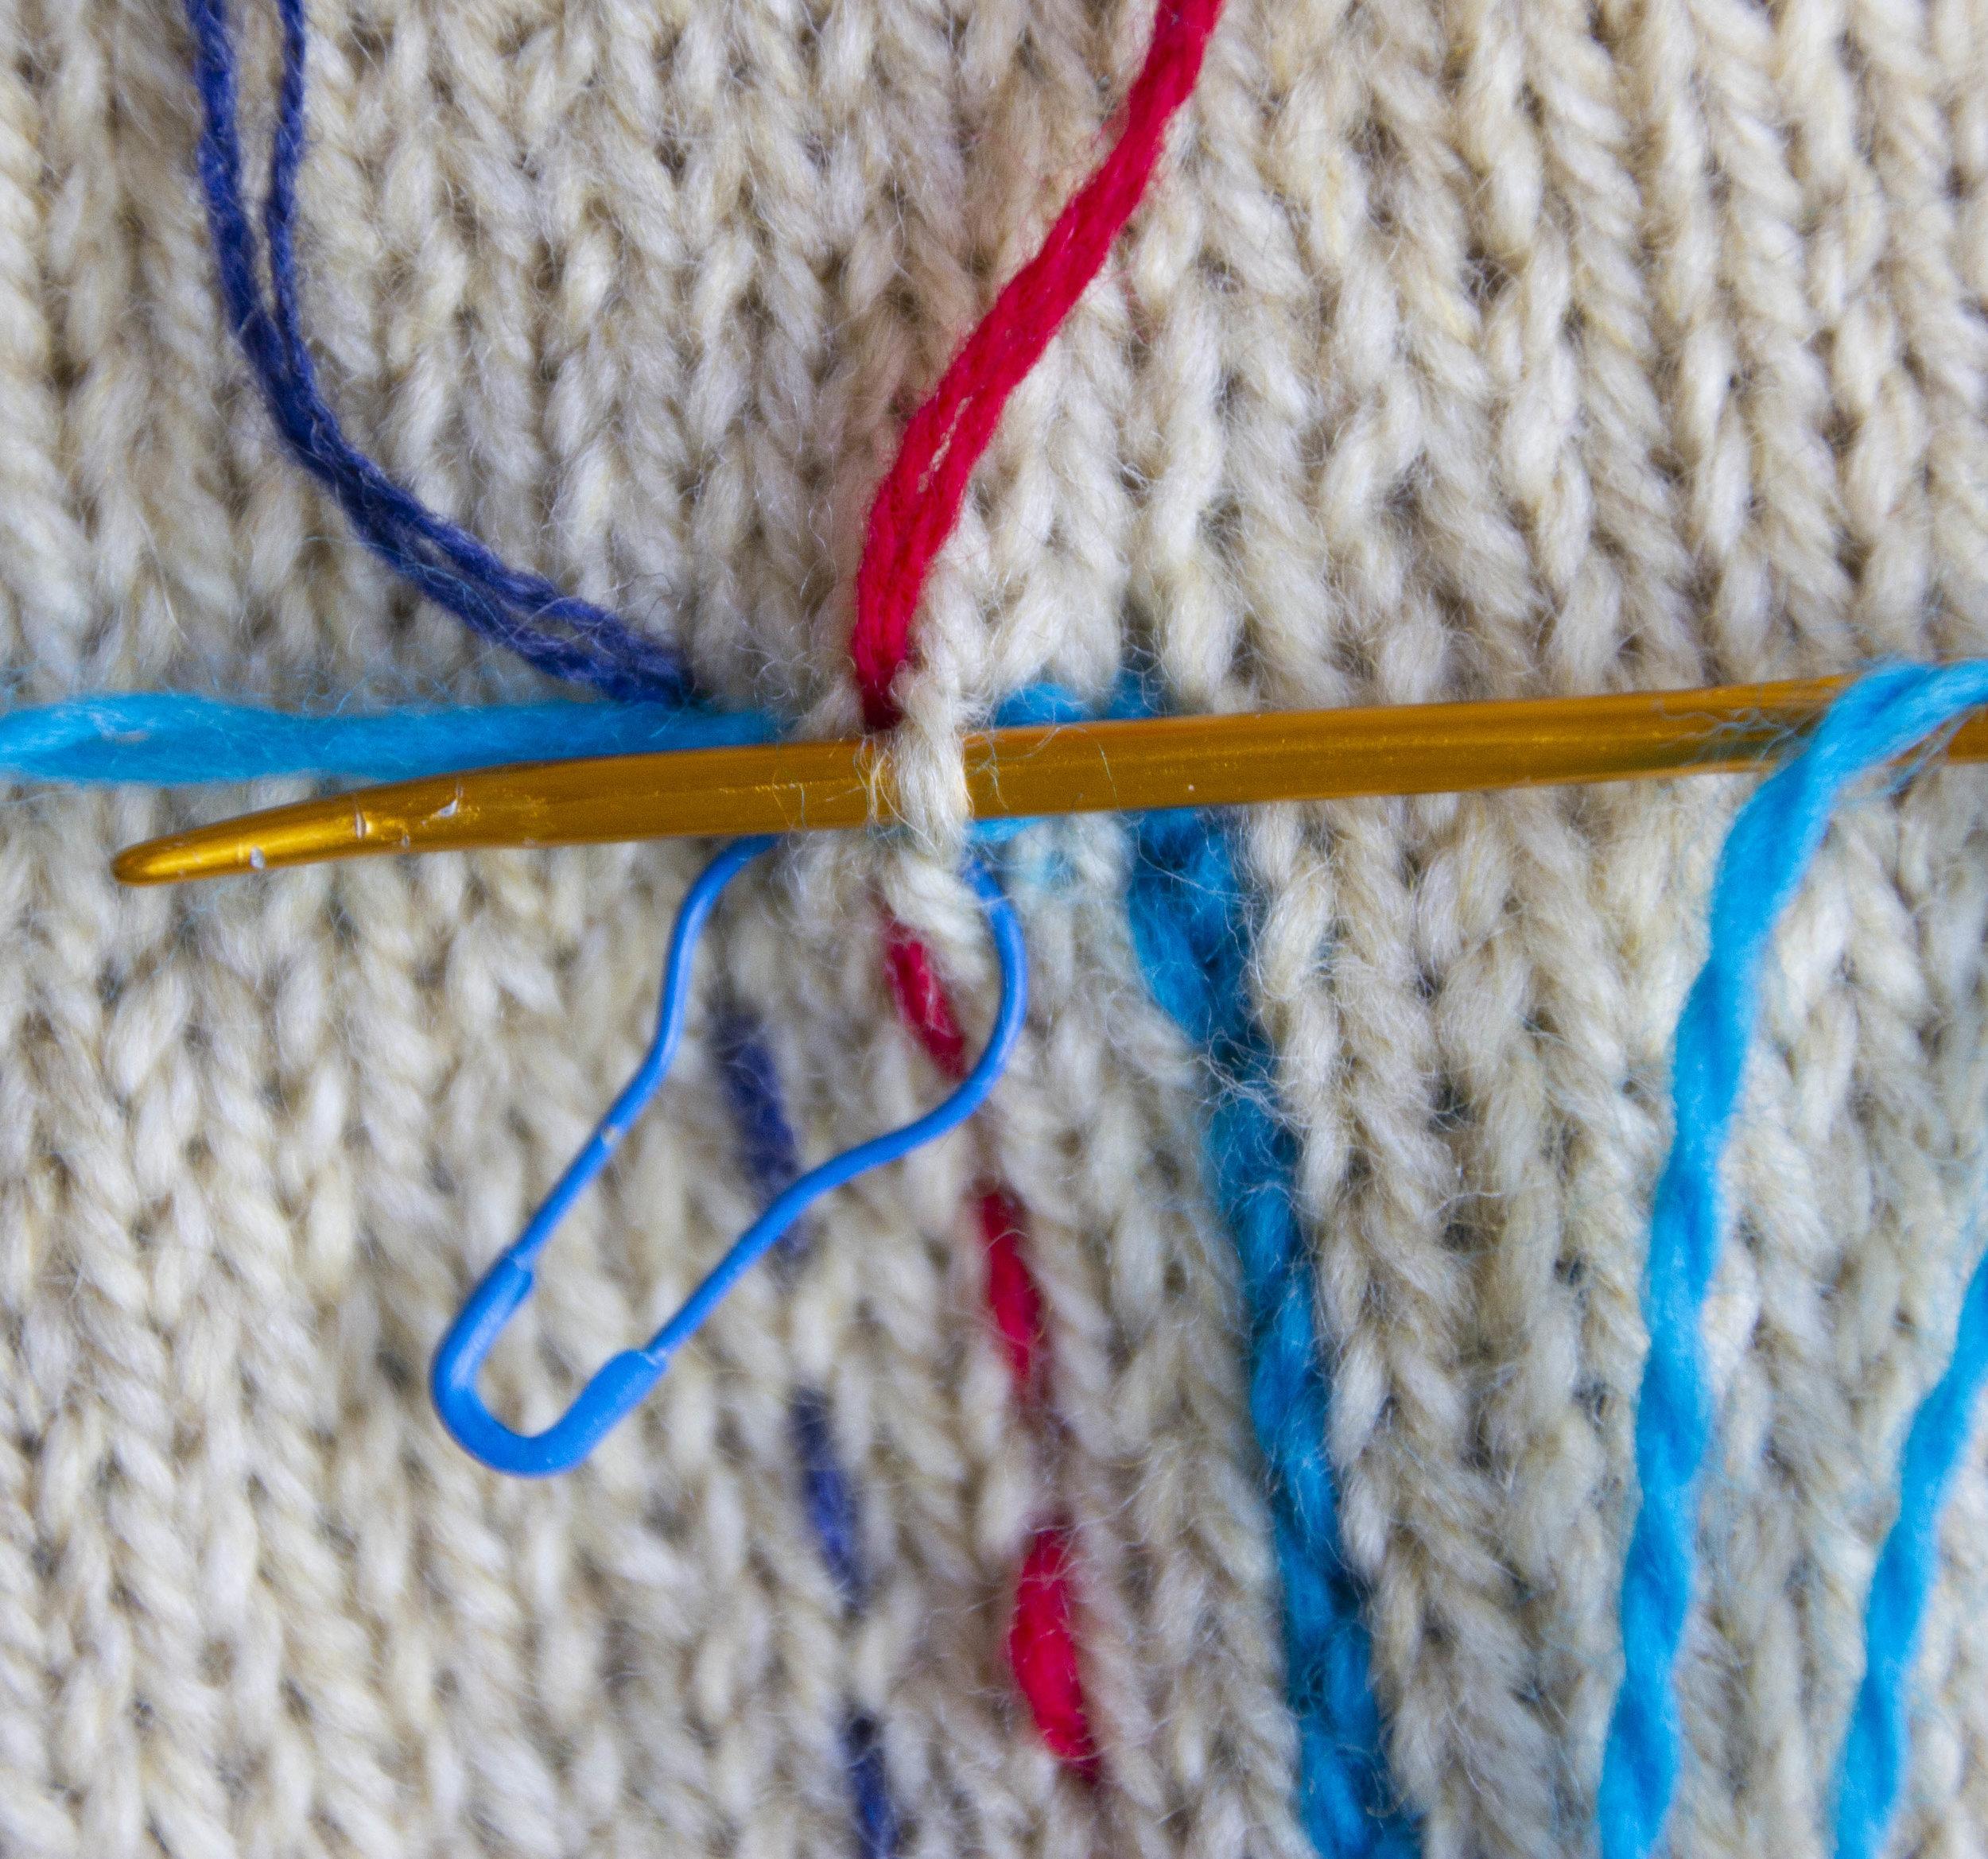 merele back stitch steek 22.jpg